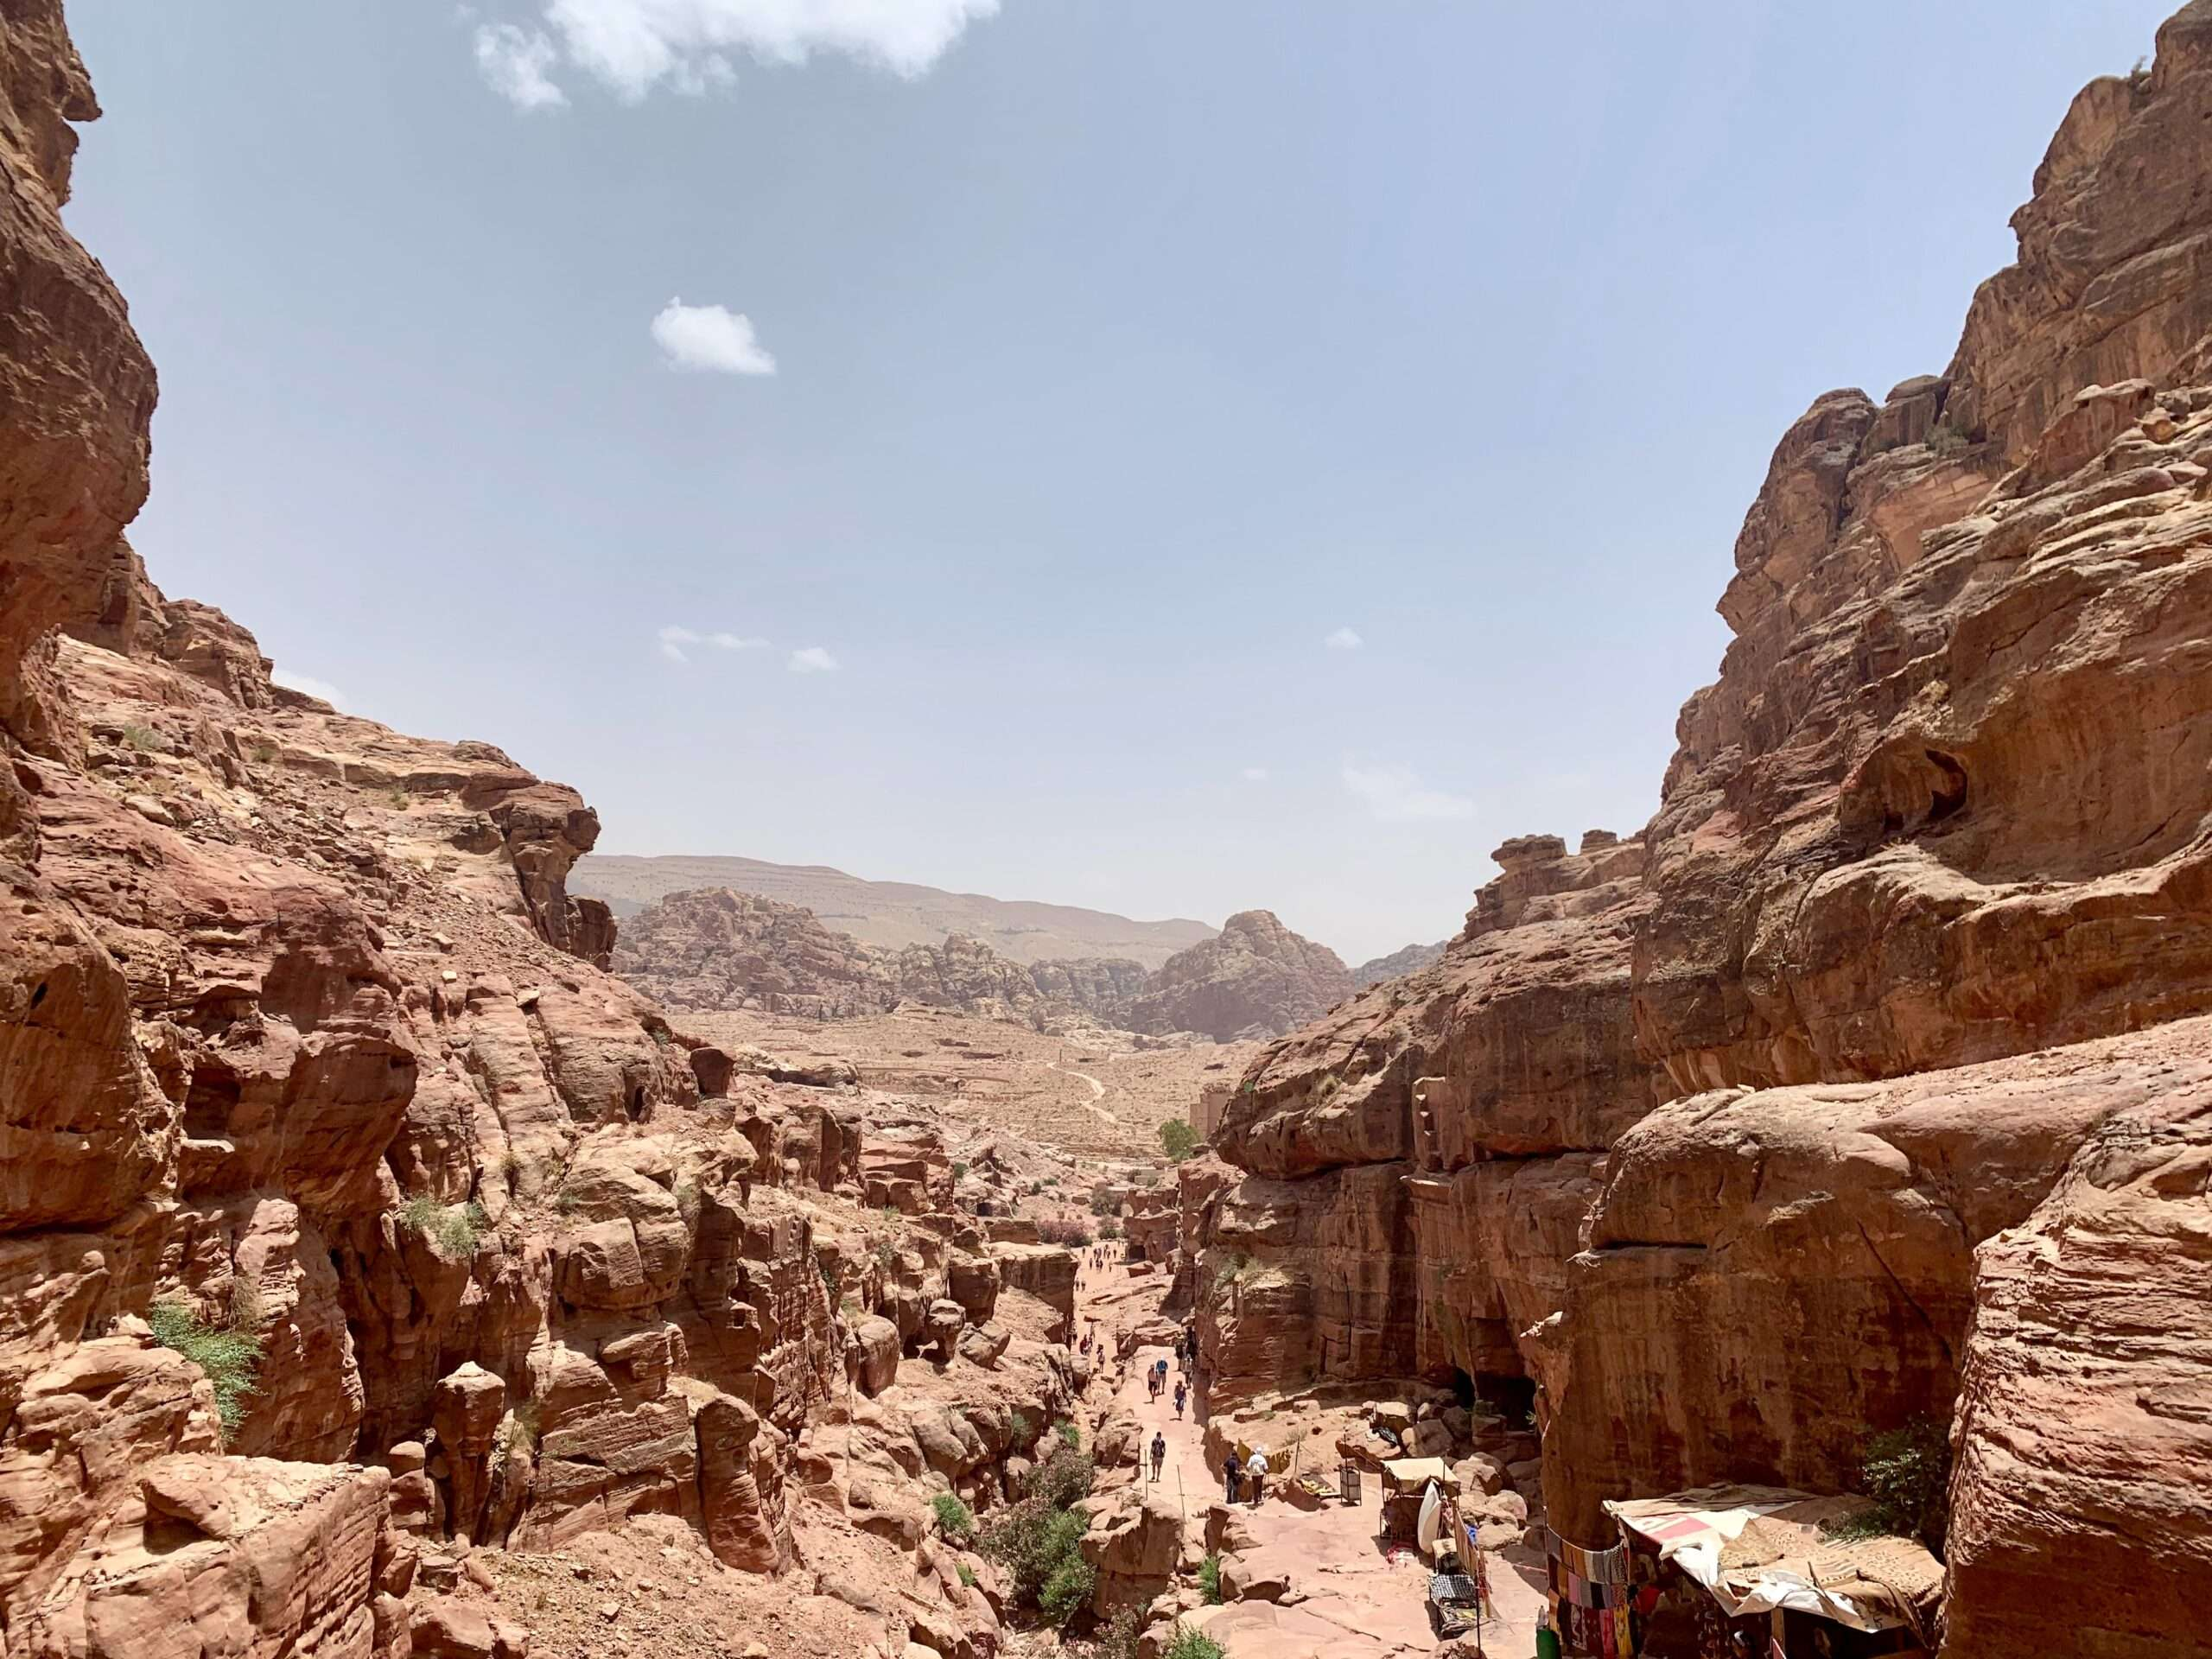 narrow passage through high walls of orange rocks, as seen during travel to Petra